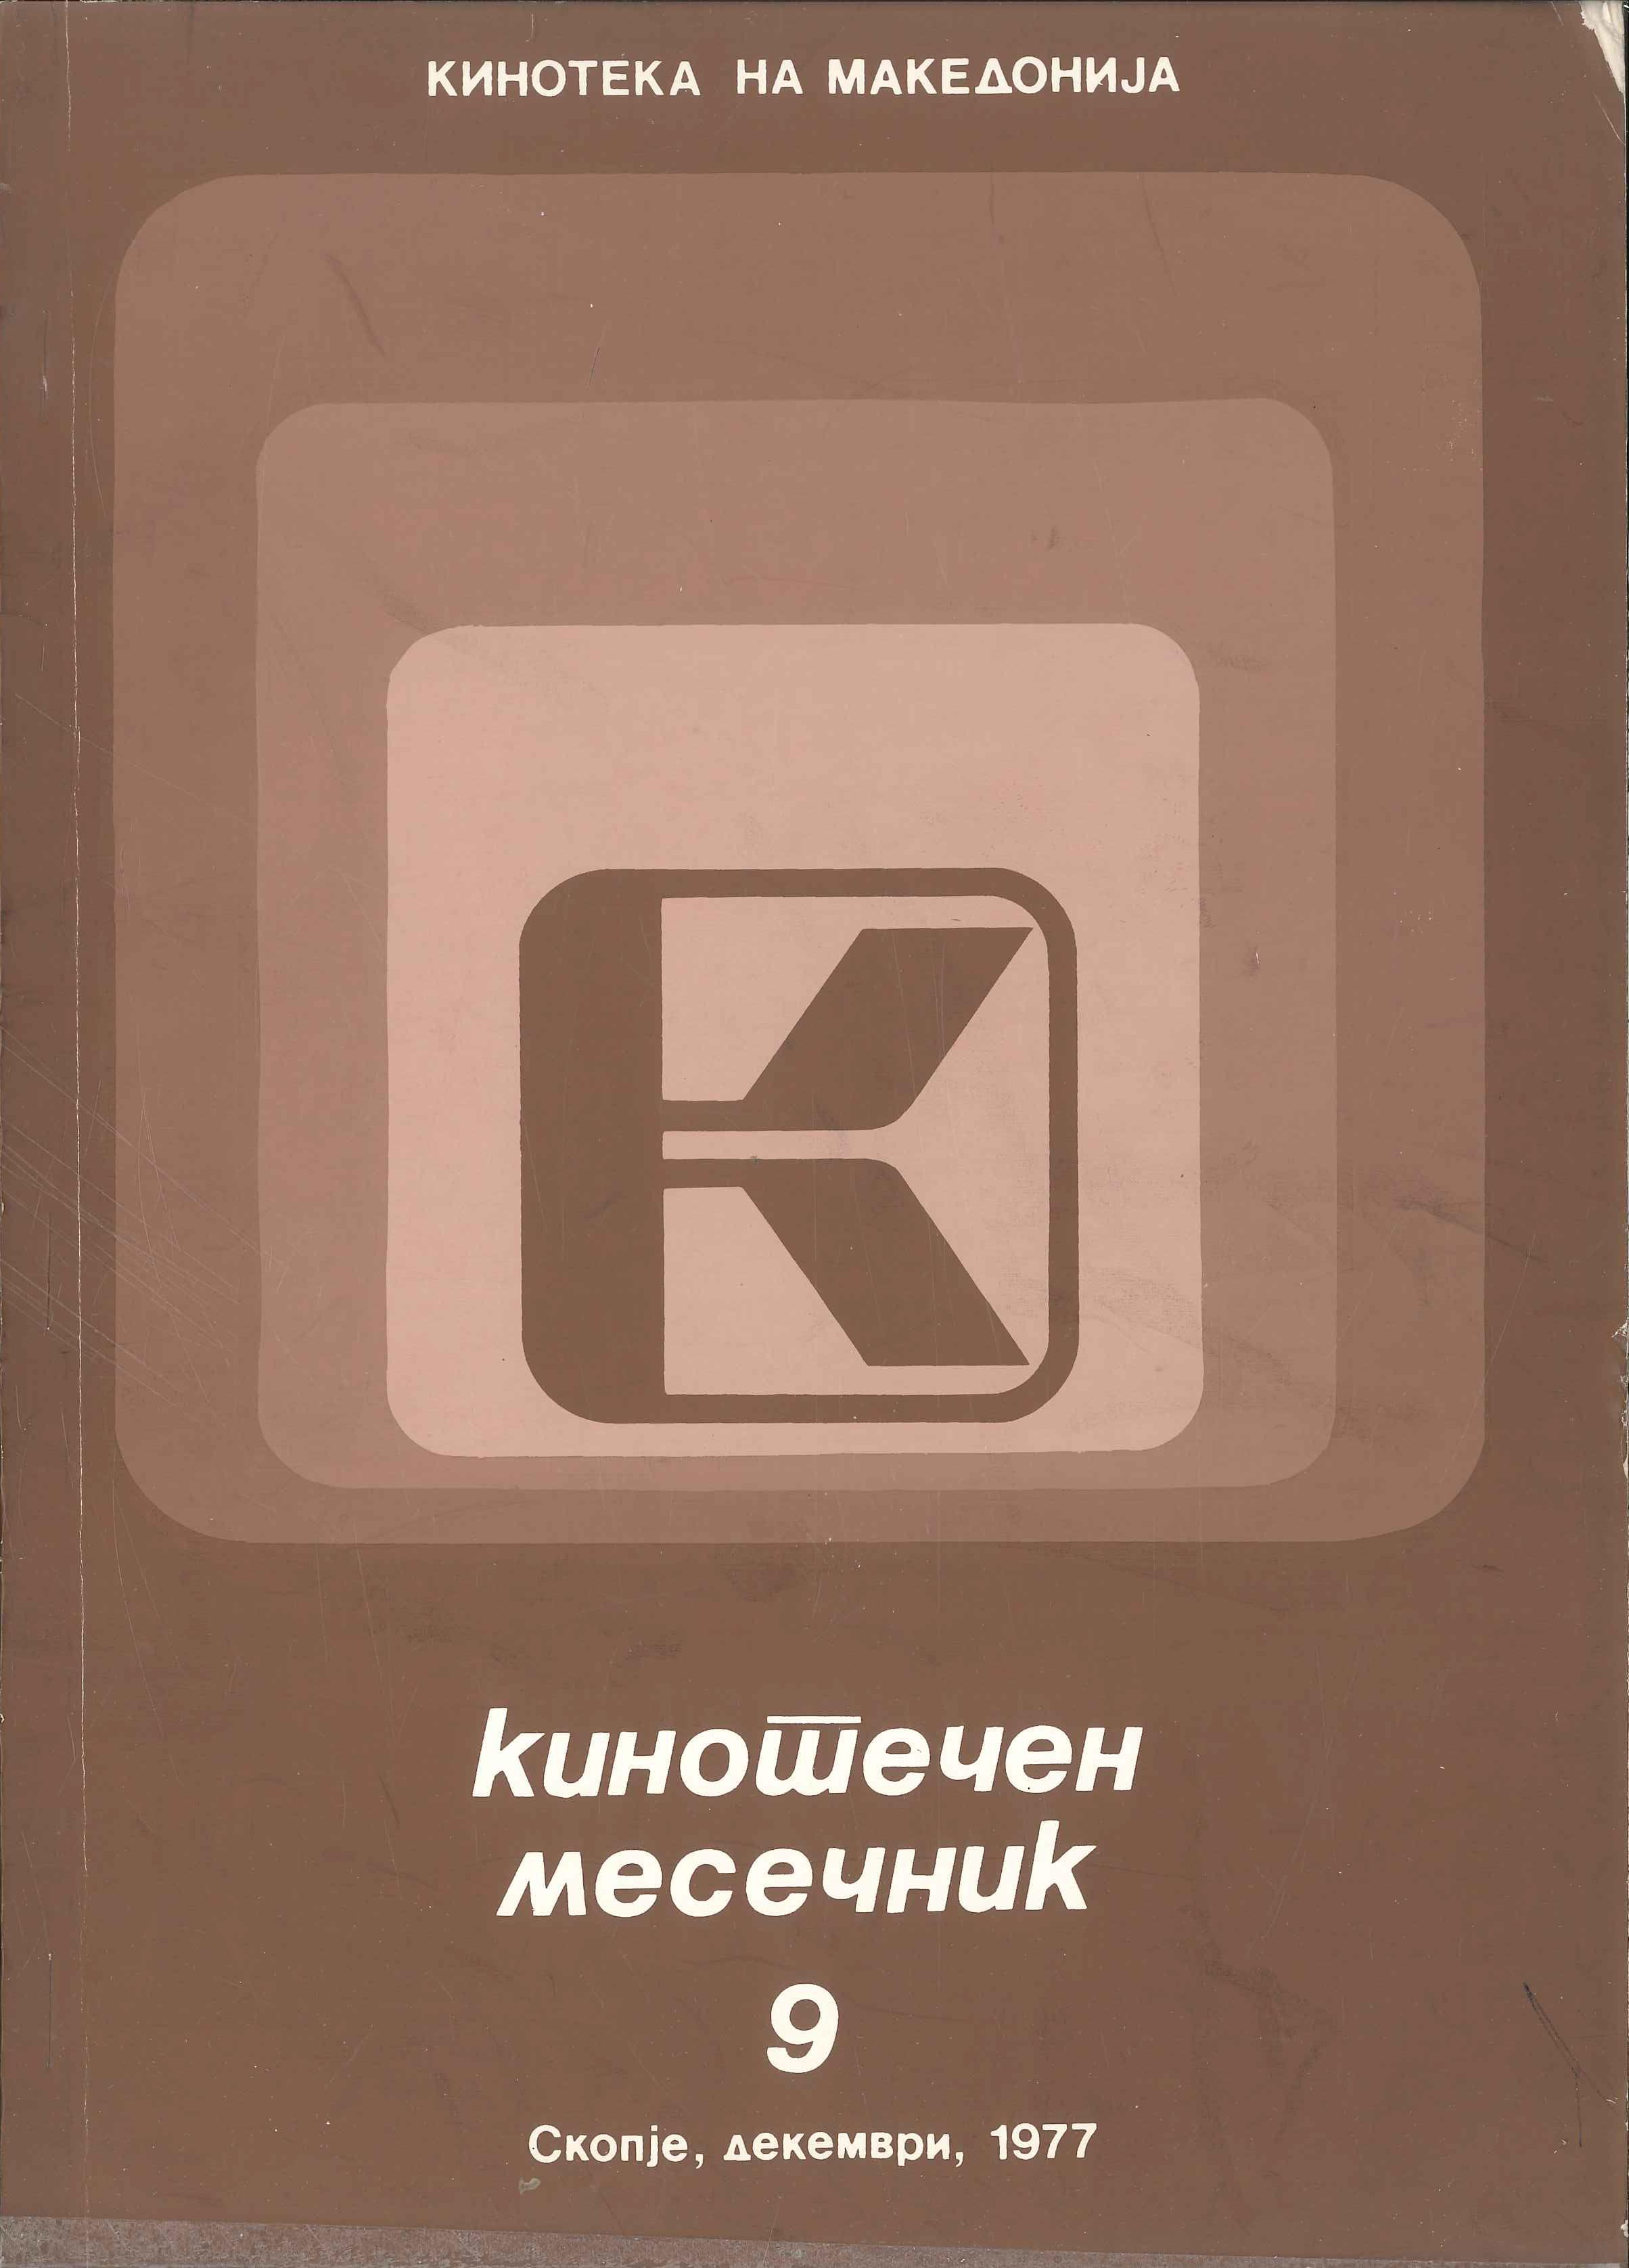 Кинотечен месечник бр. 9